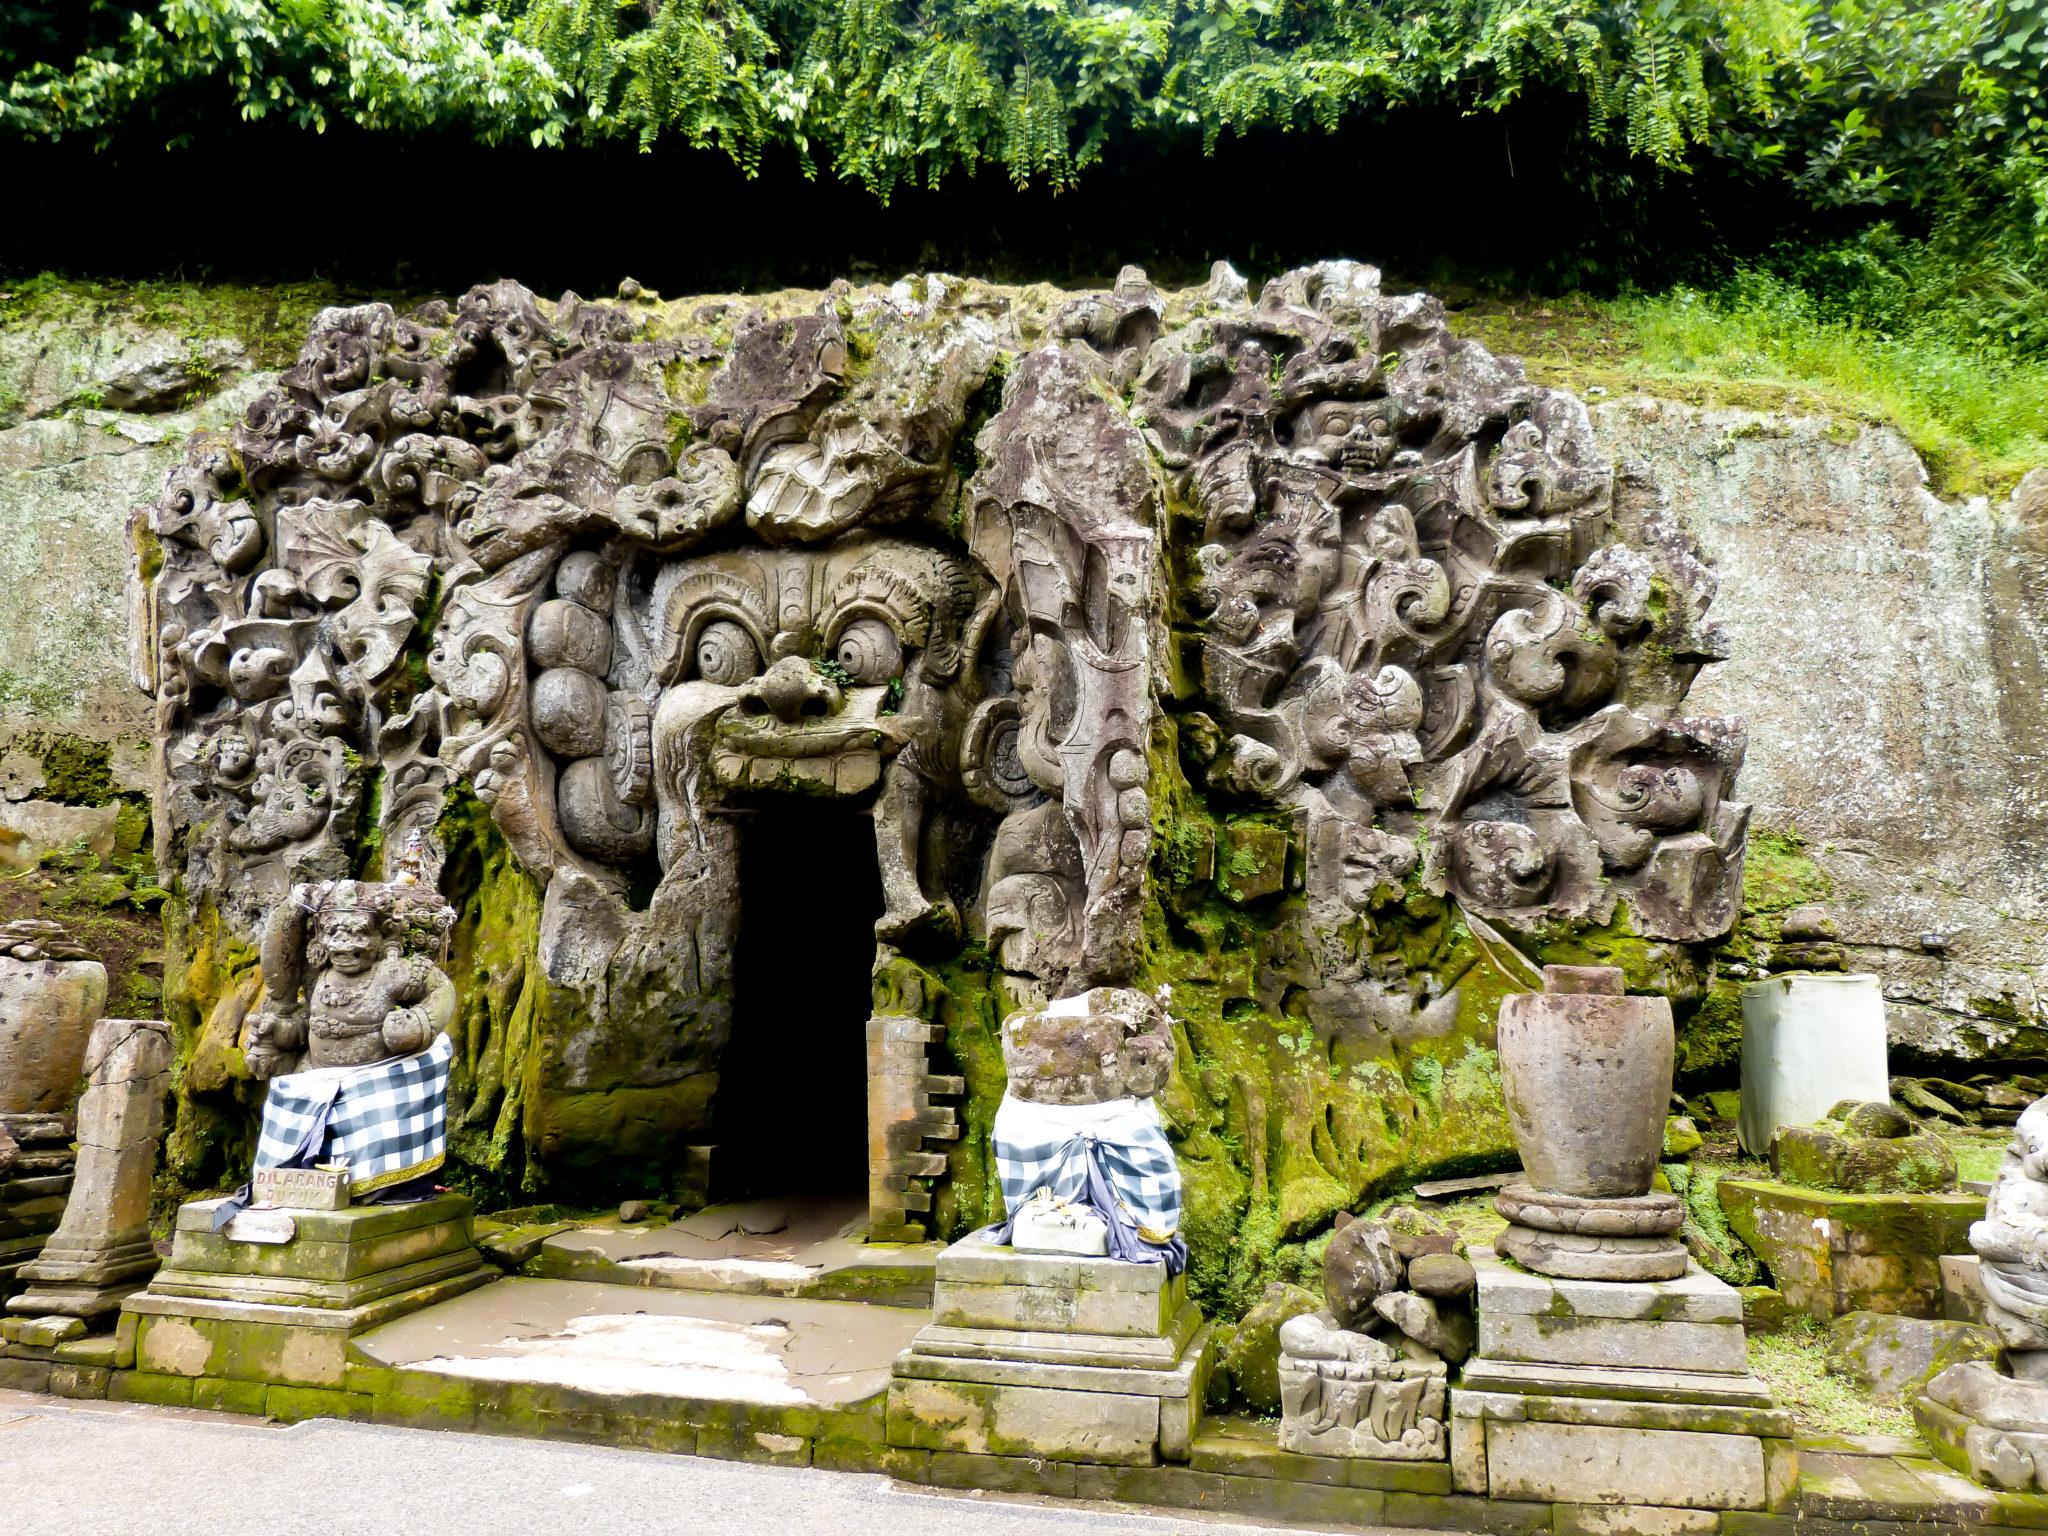 Bali 2 week itinerary includes temples like Goa Gajah